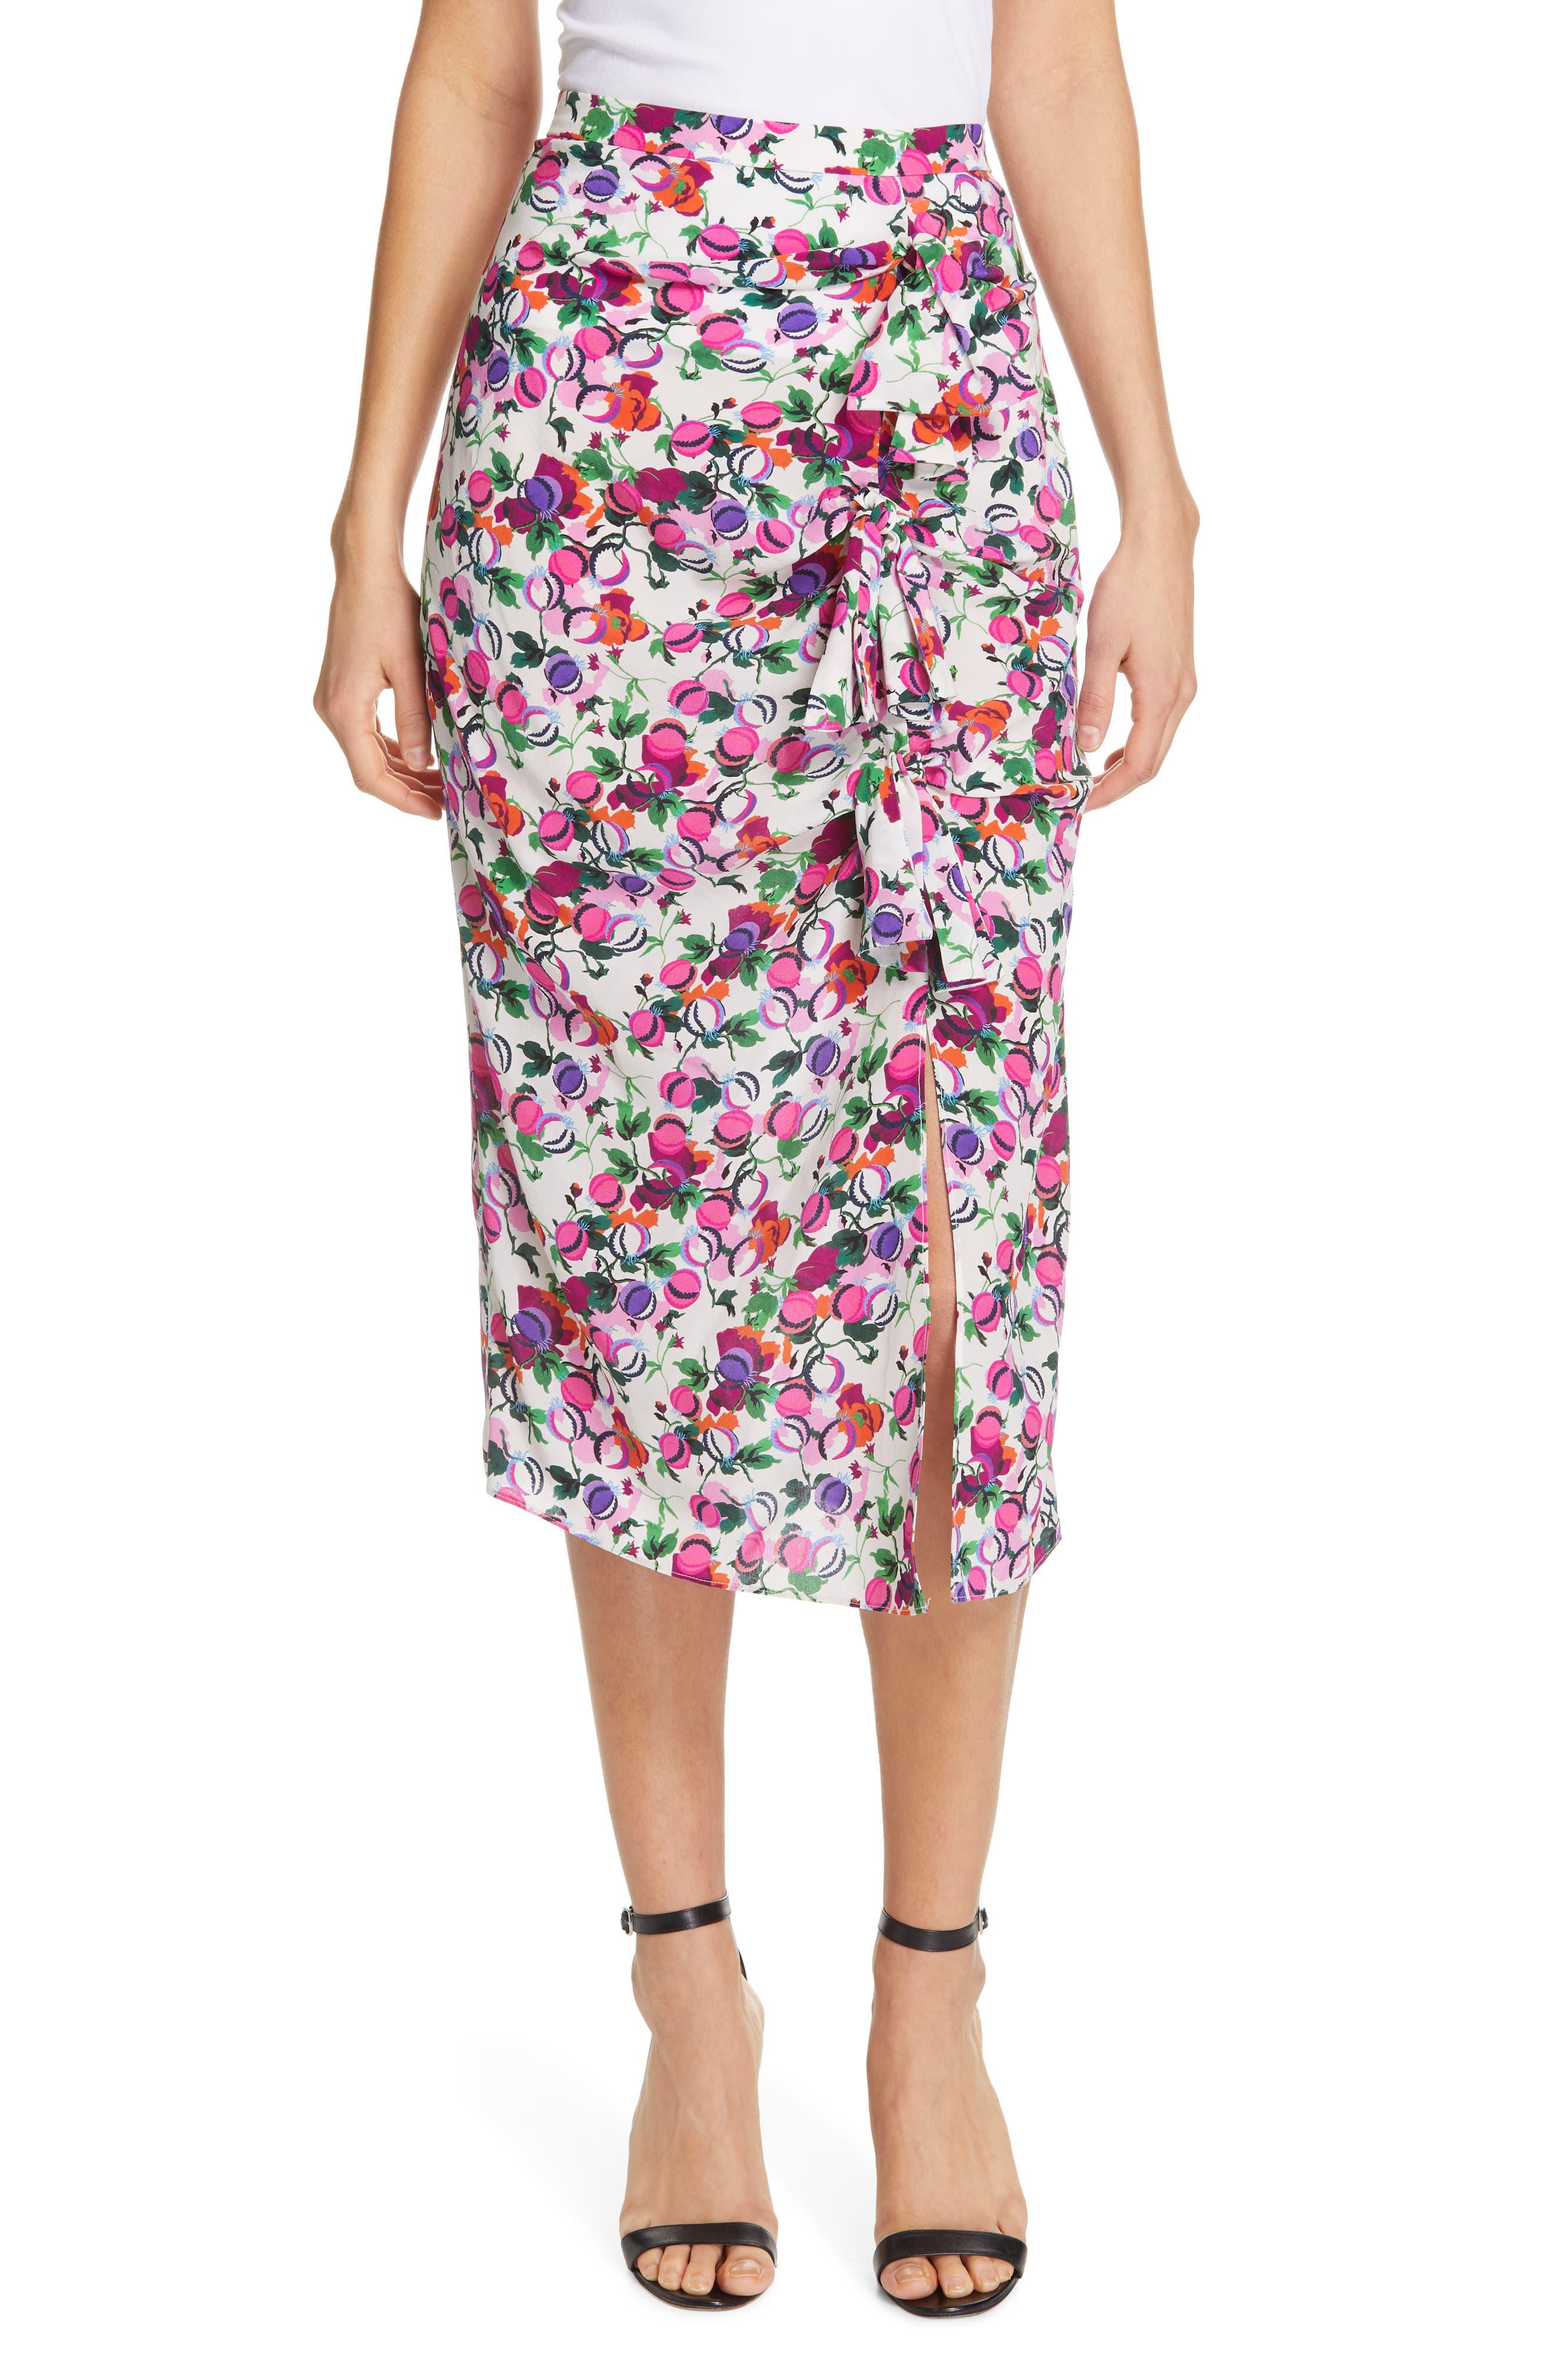 SALONI, Kelly Floral Print Silk Skirt, Main thumbnail 1, color, ROSE BOUNTY